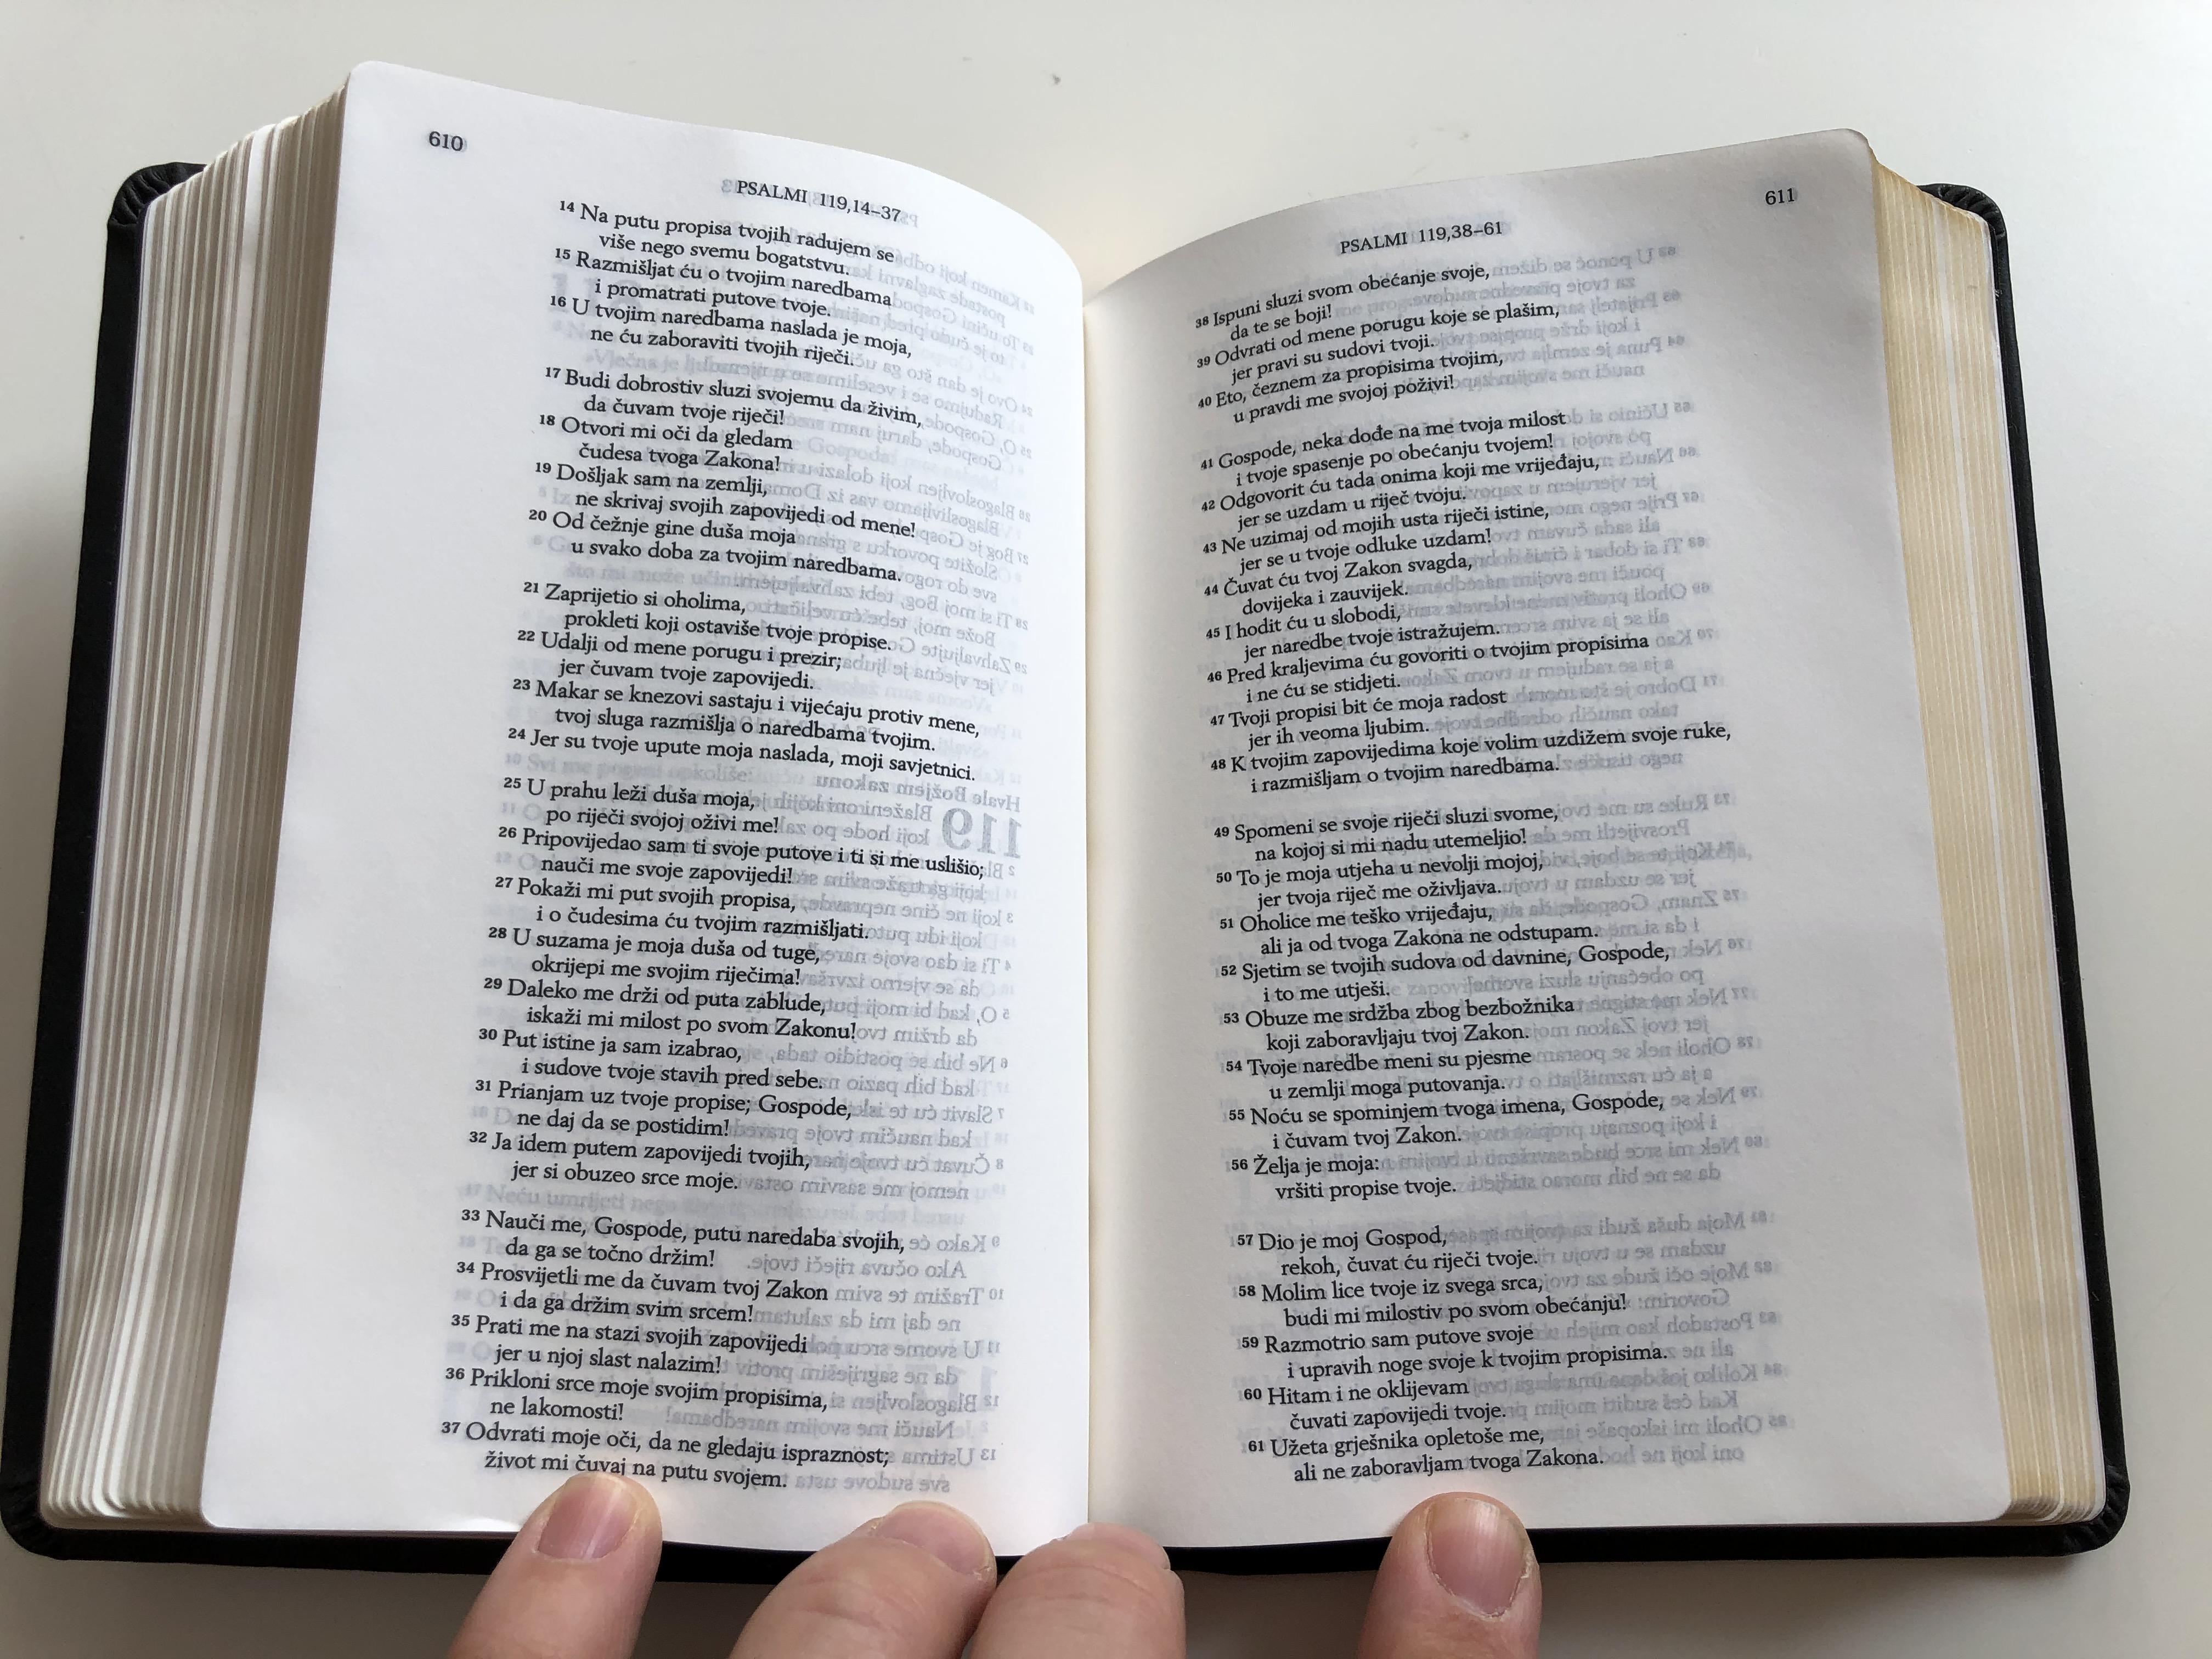 biblija-holy-bible-in-croatian-language-leather-bound-black-golden-edges-9.jpg